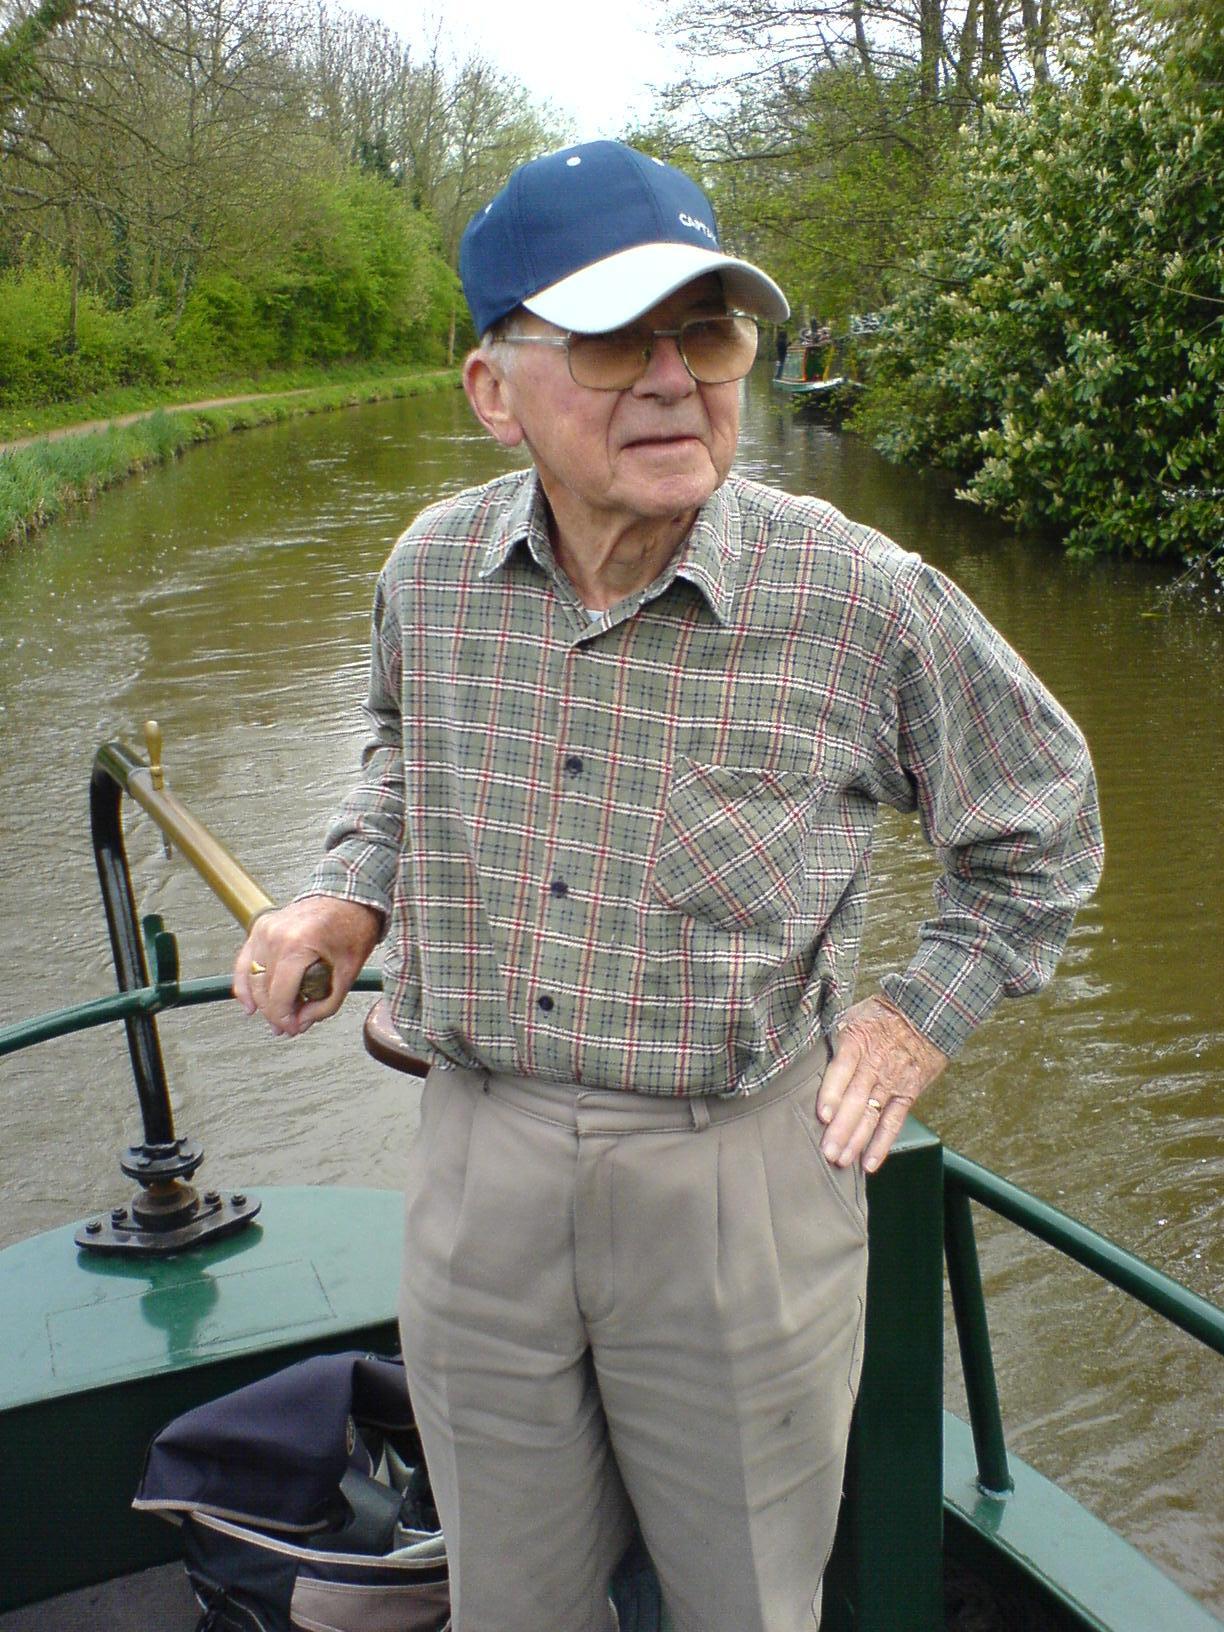 Narrow boating